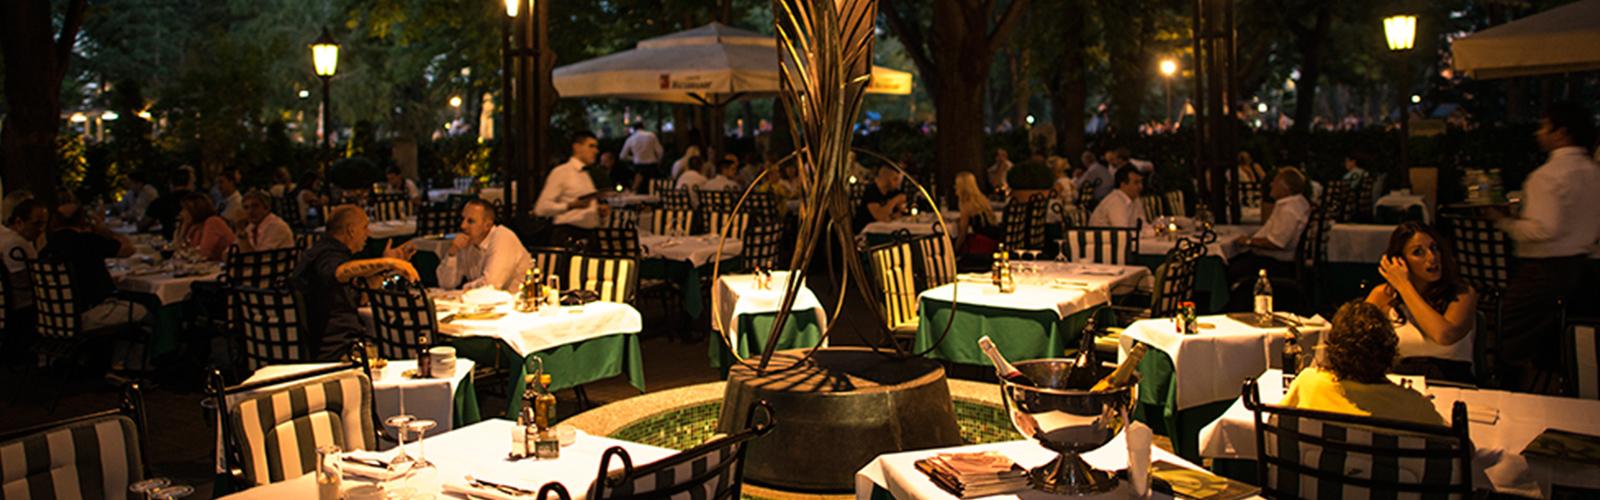 Concierge Belgrade | Restaurant Madera